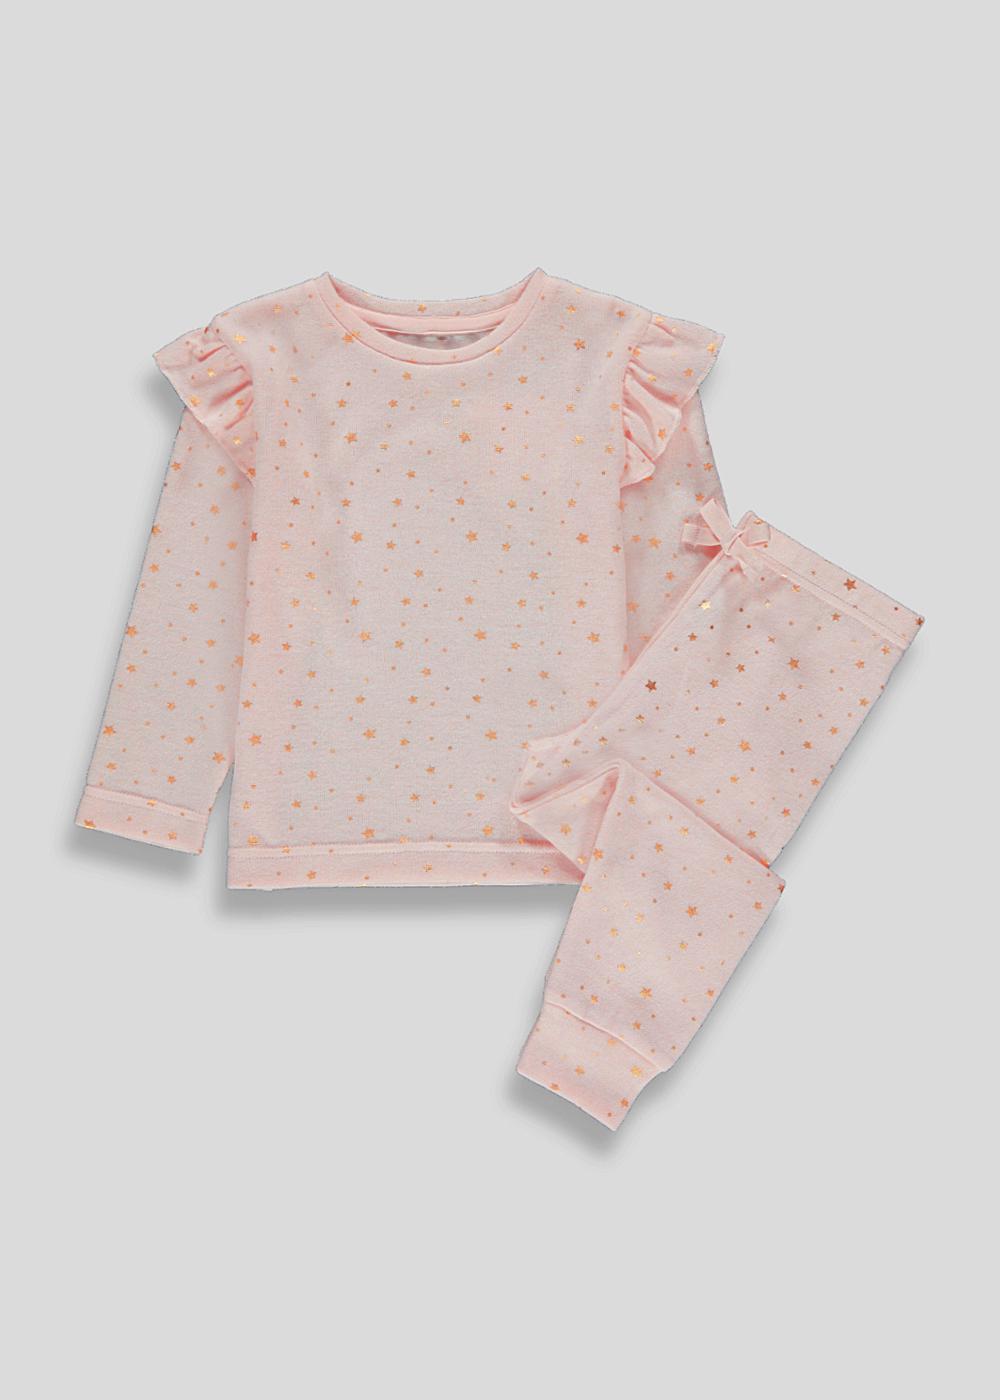 Girls Fleece Pyjama Set in sizes 3yrs 4yrs and 5yrs